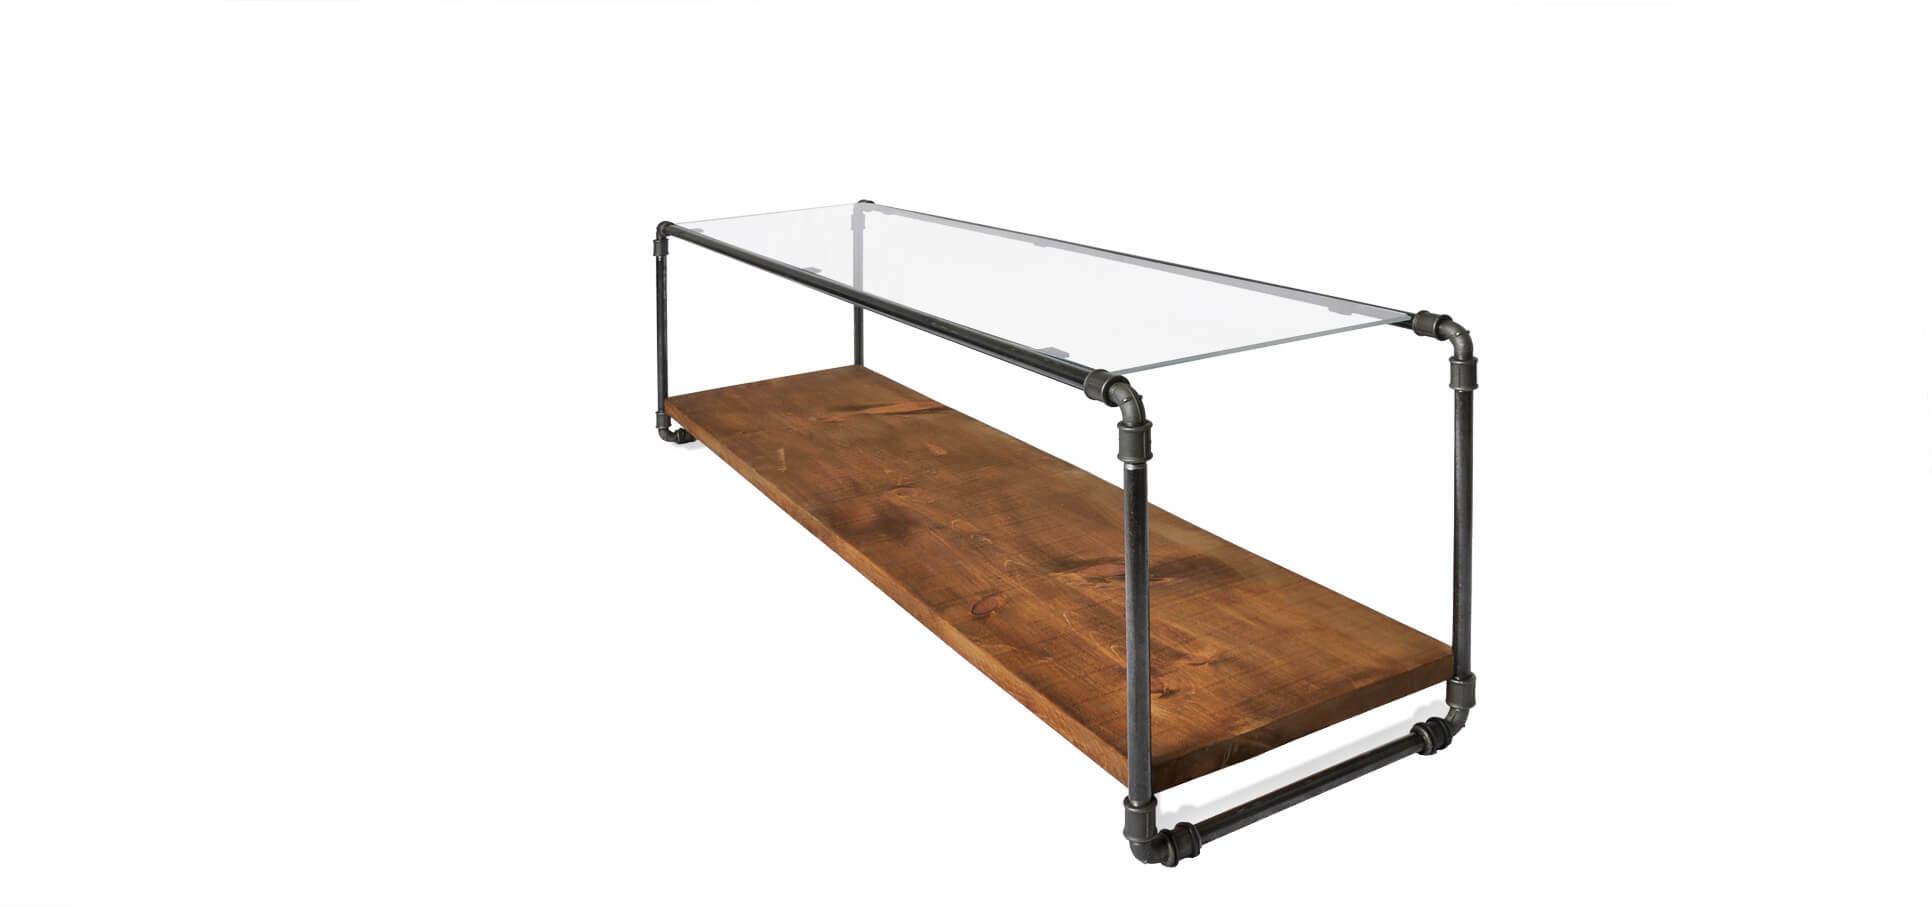 Low-Board-ueber-Eck-ohne.jpg